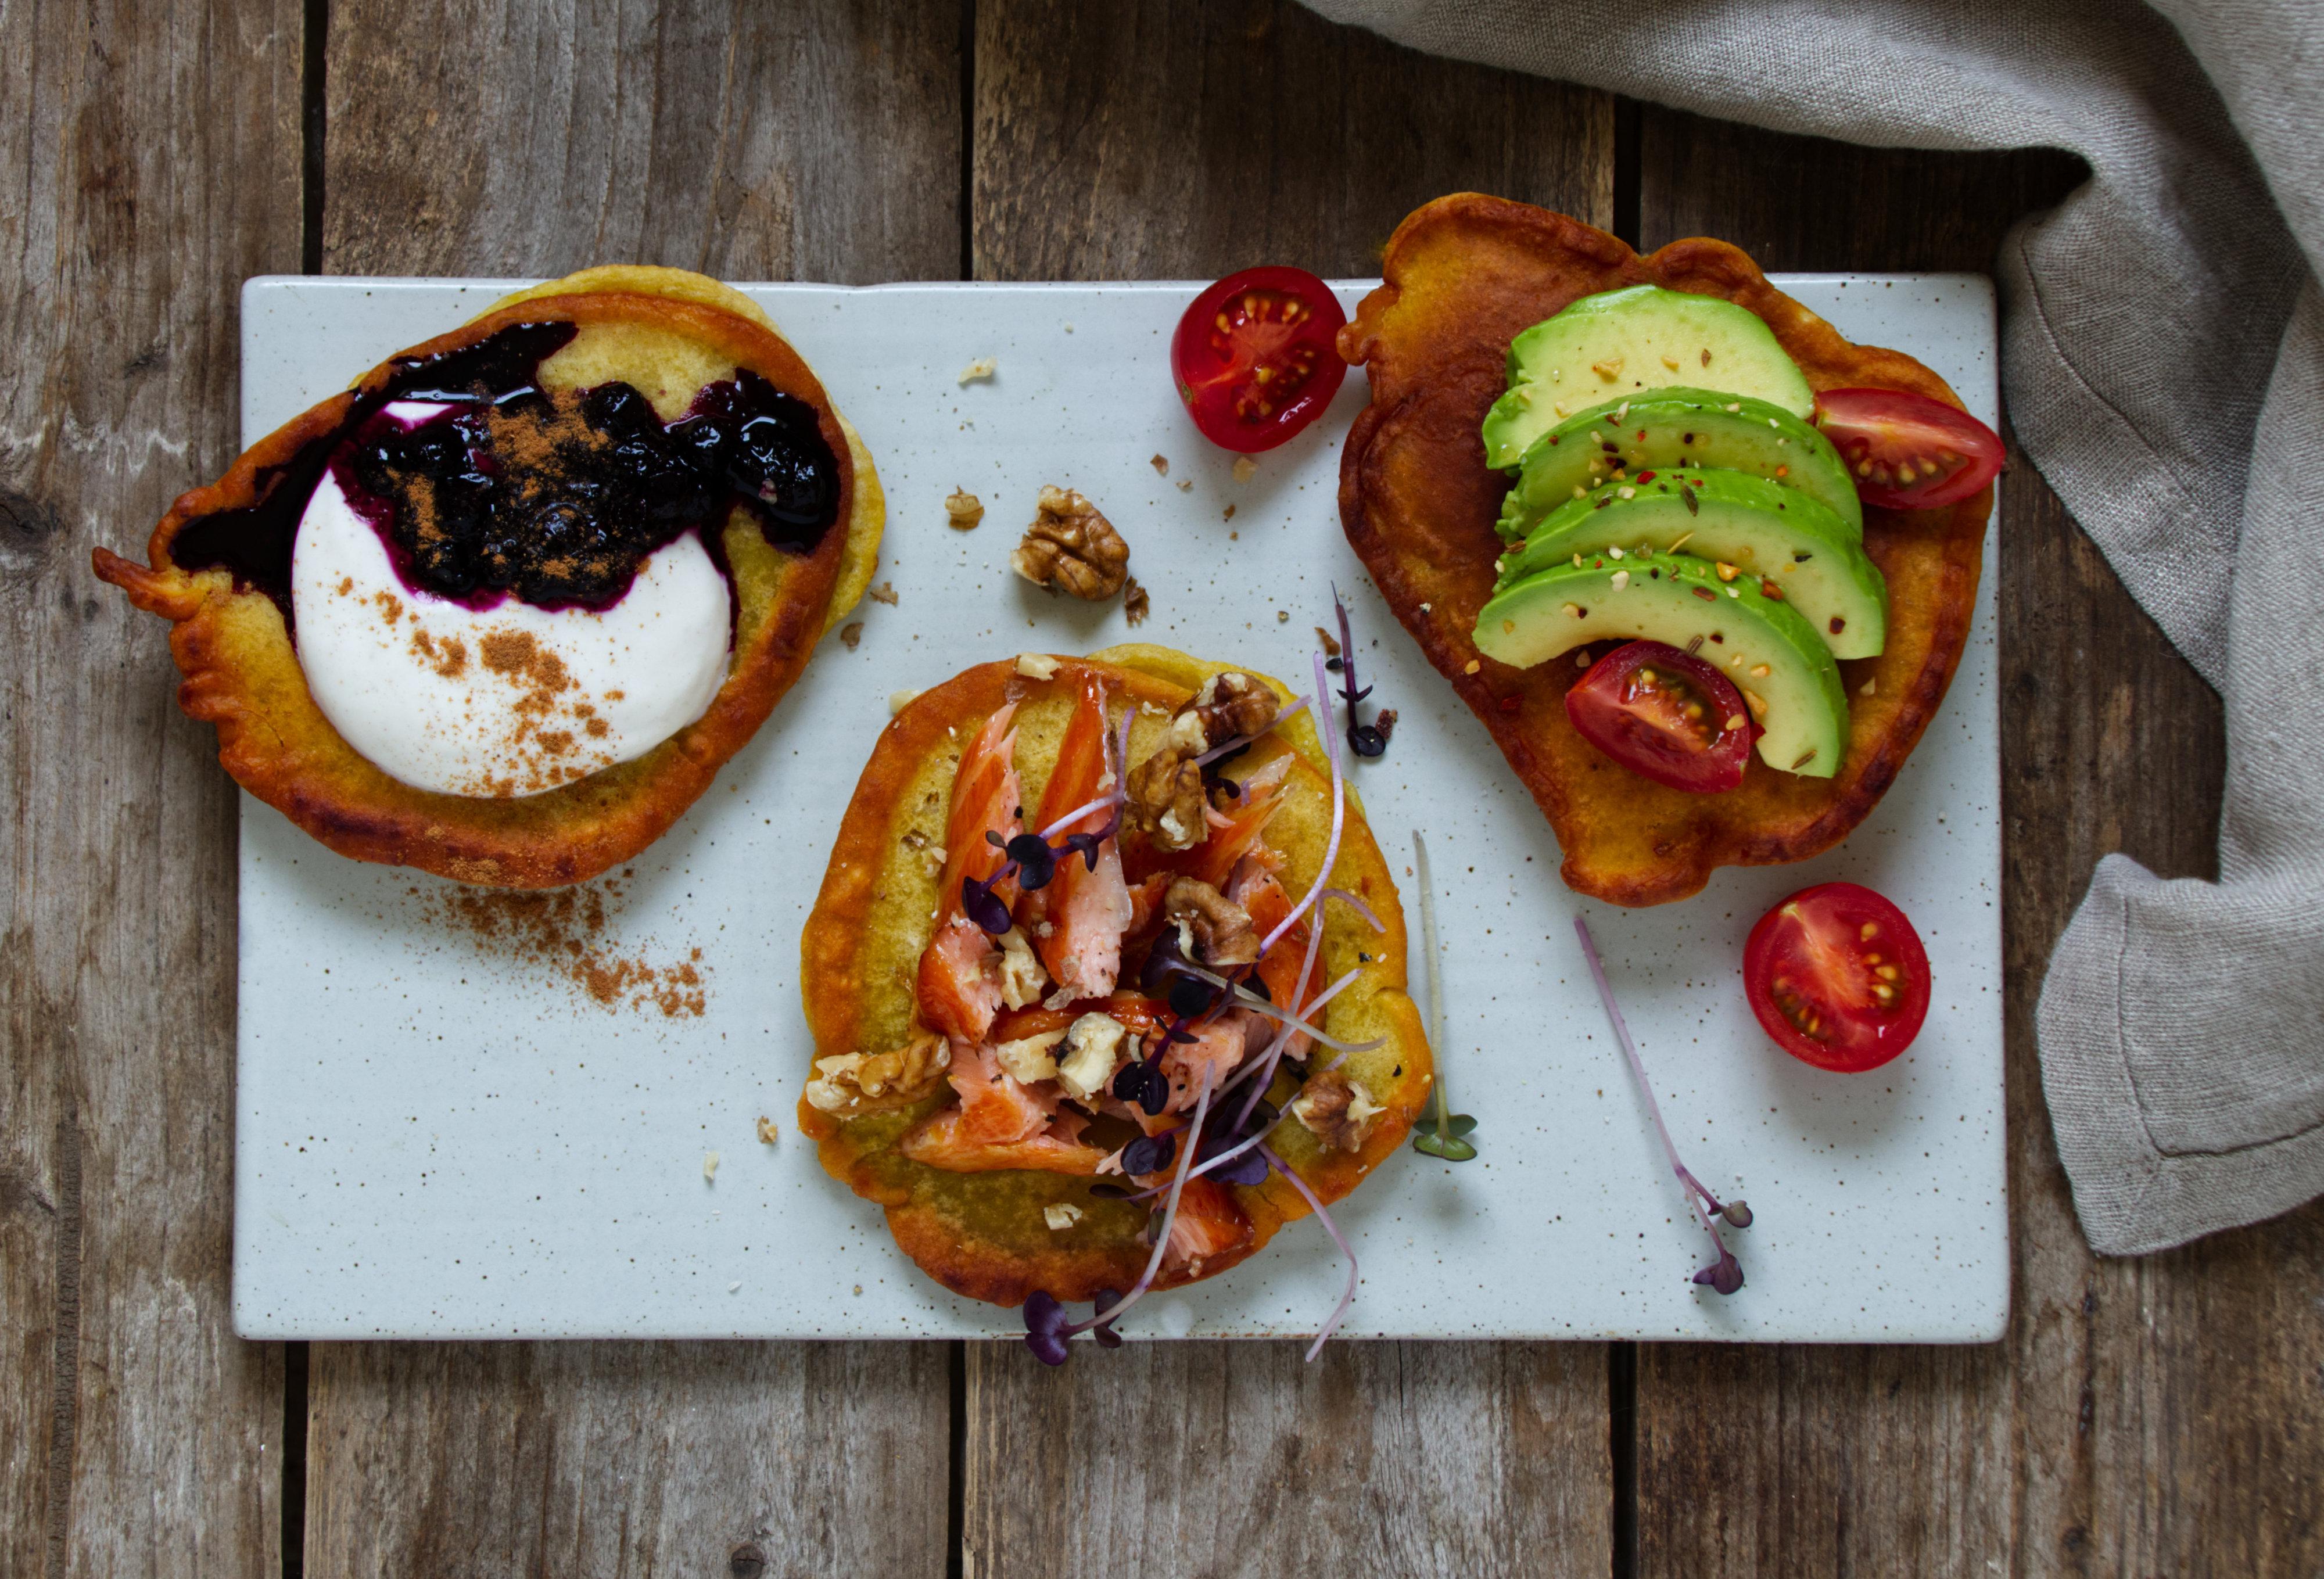 Dinkelpancakes mit verschiedenen Toppings